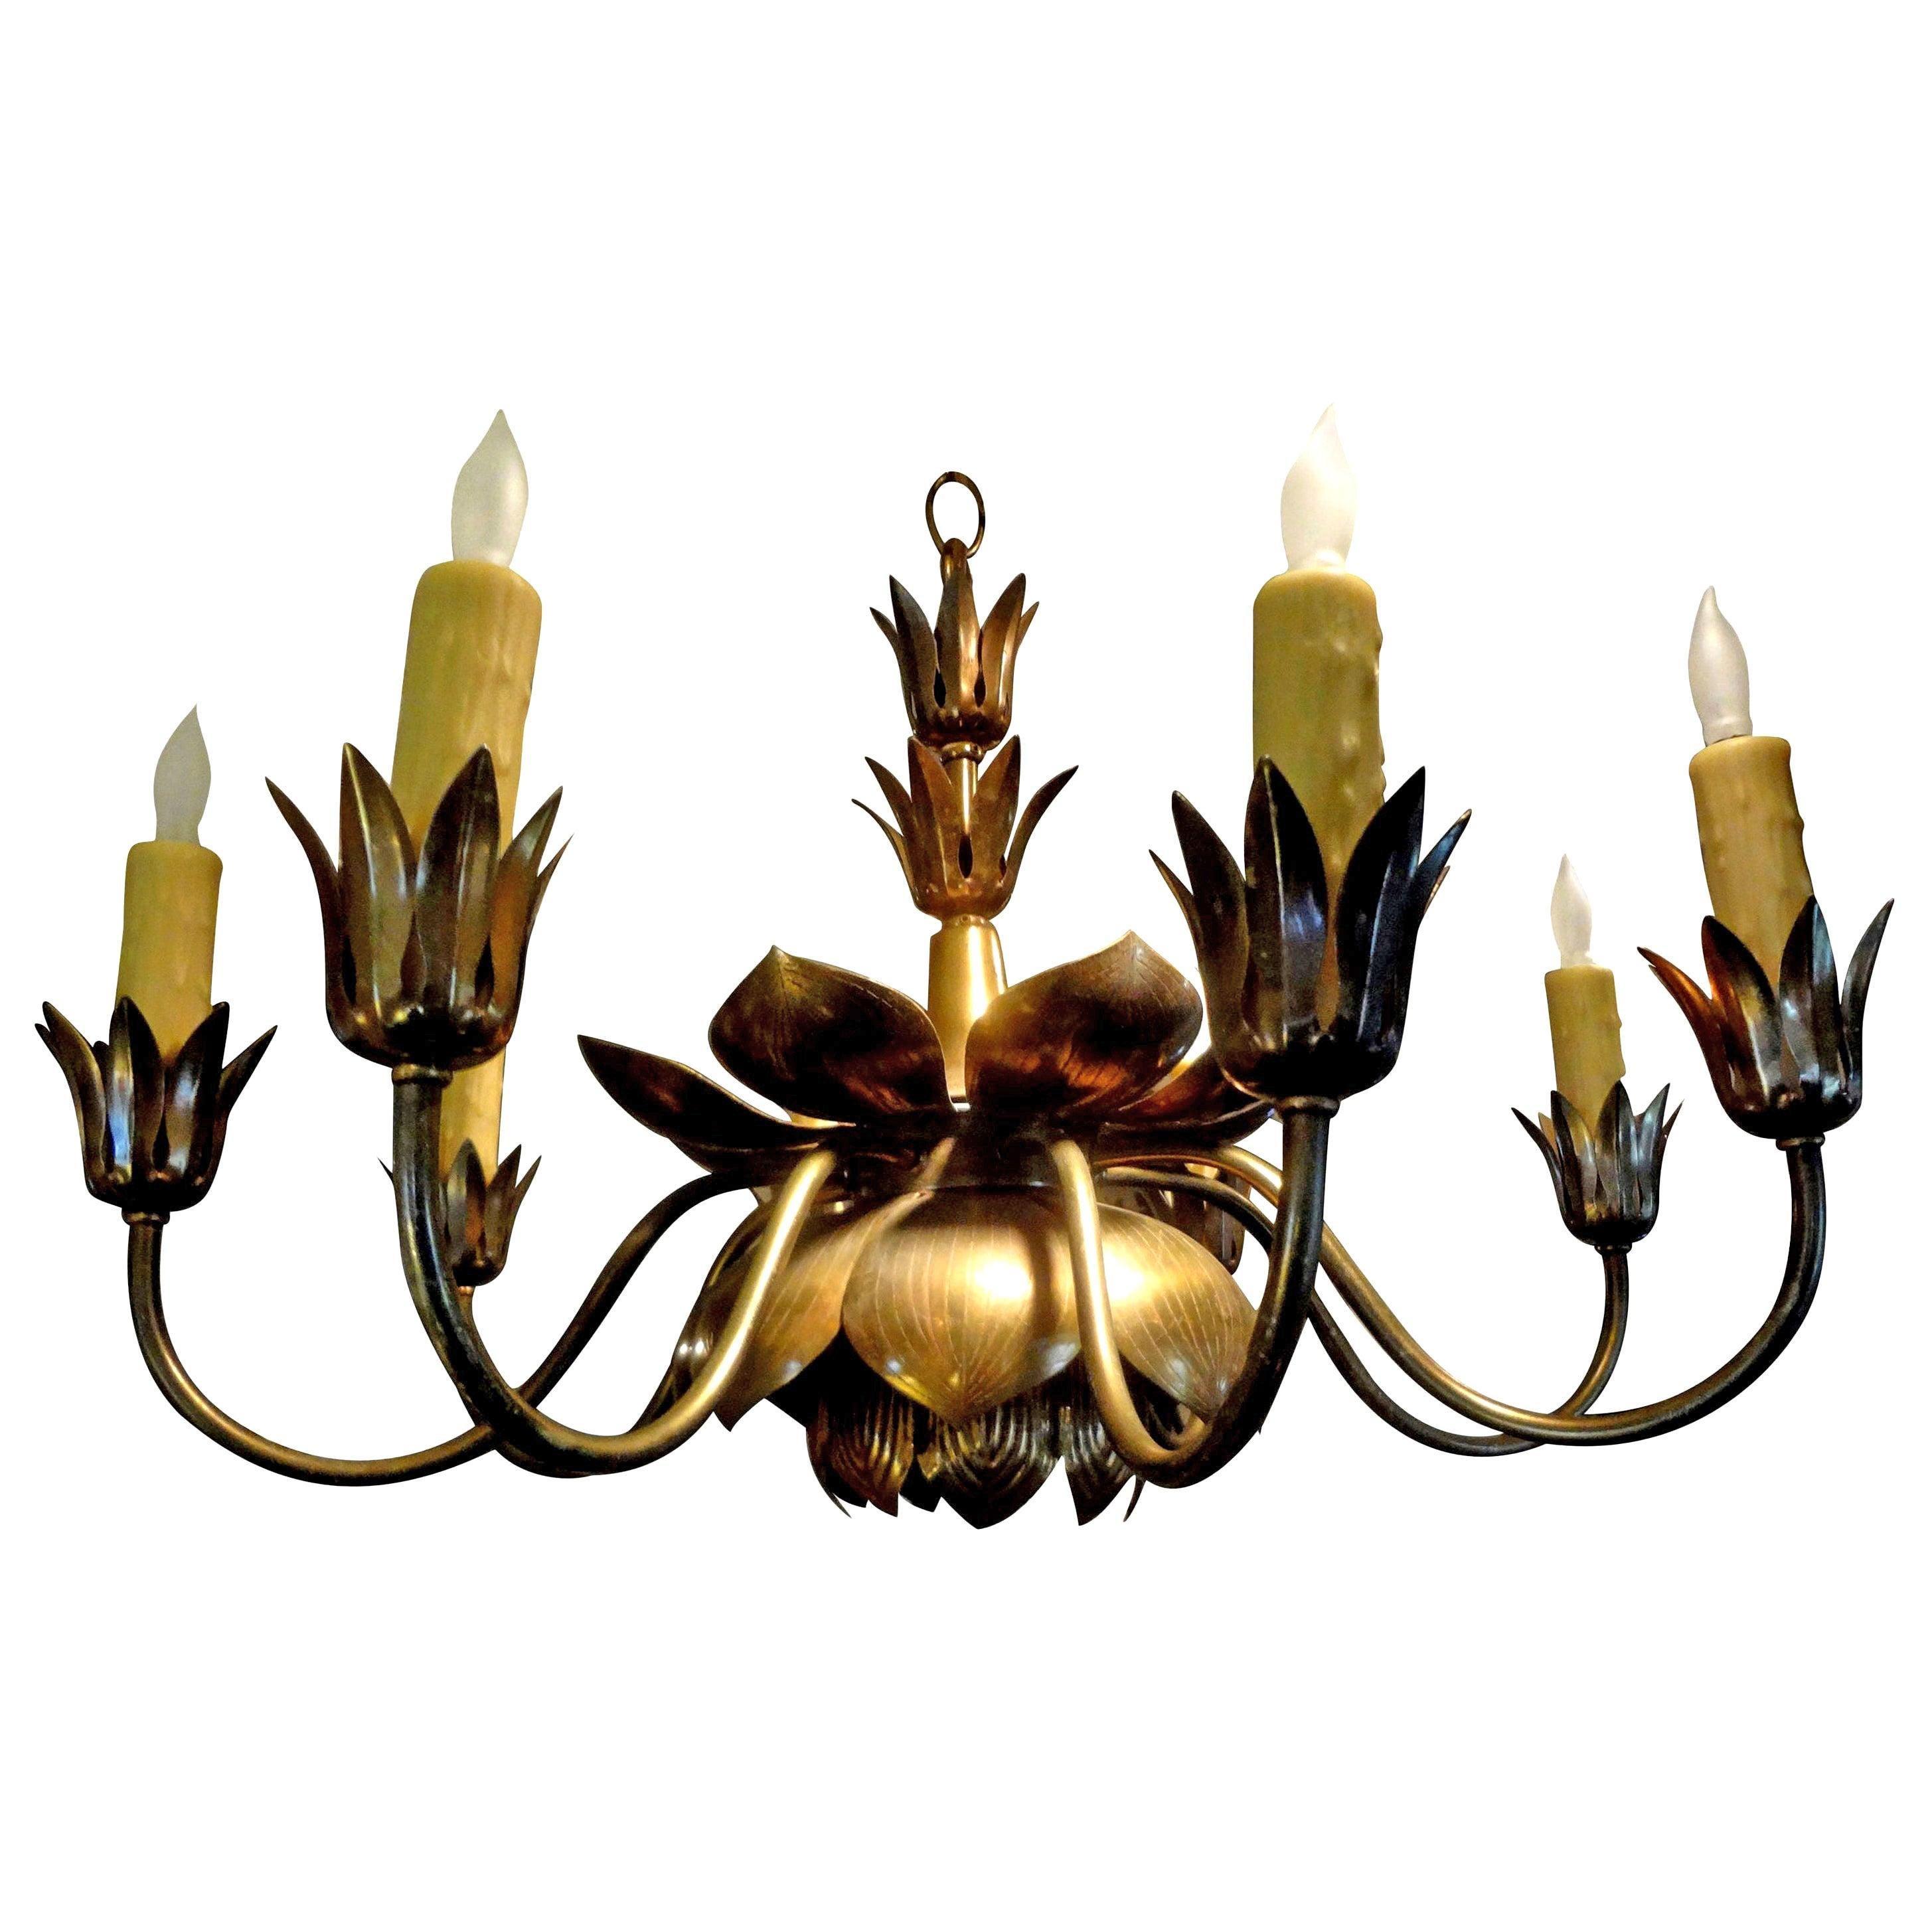 Midcentury Brass Lotus Chandelier by Feldman Lighting Co